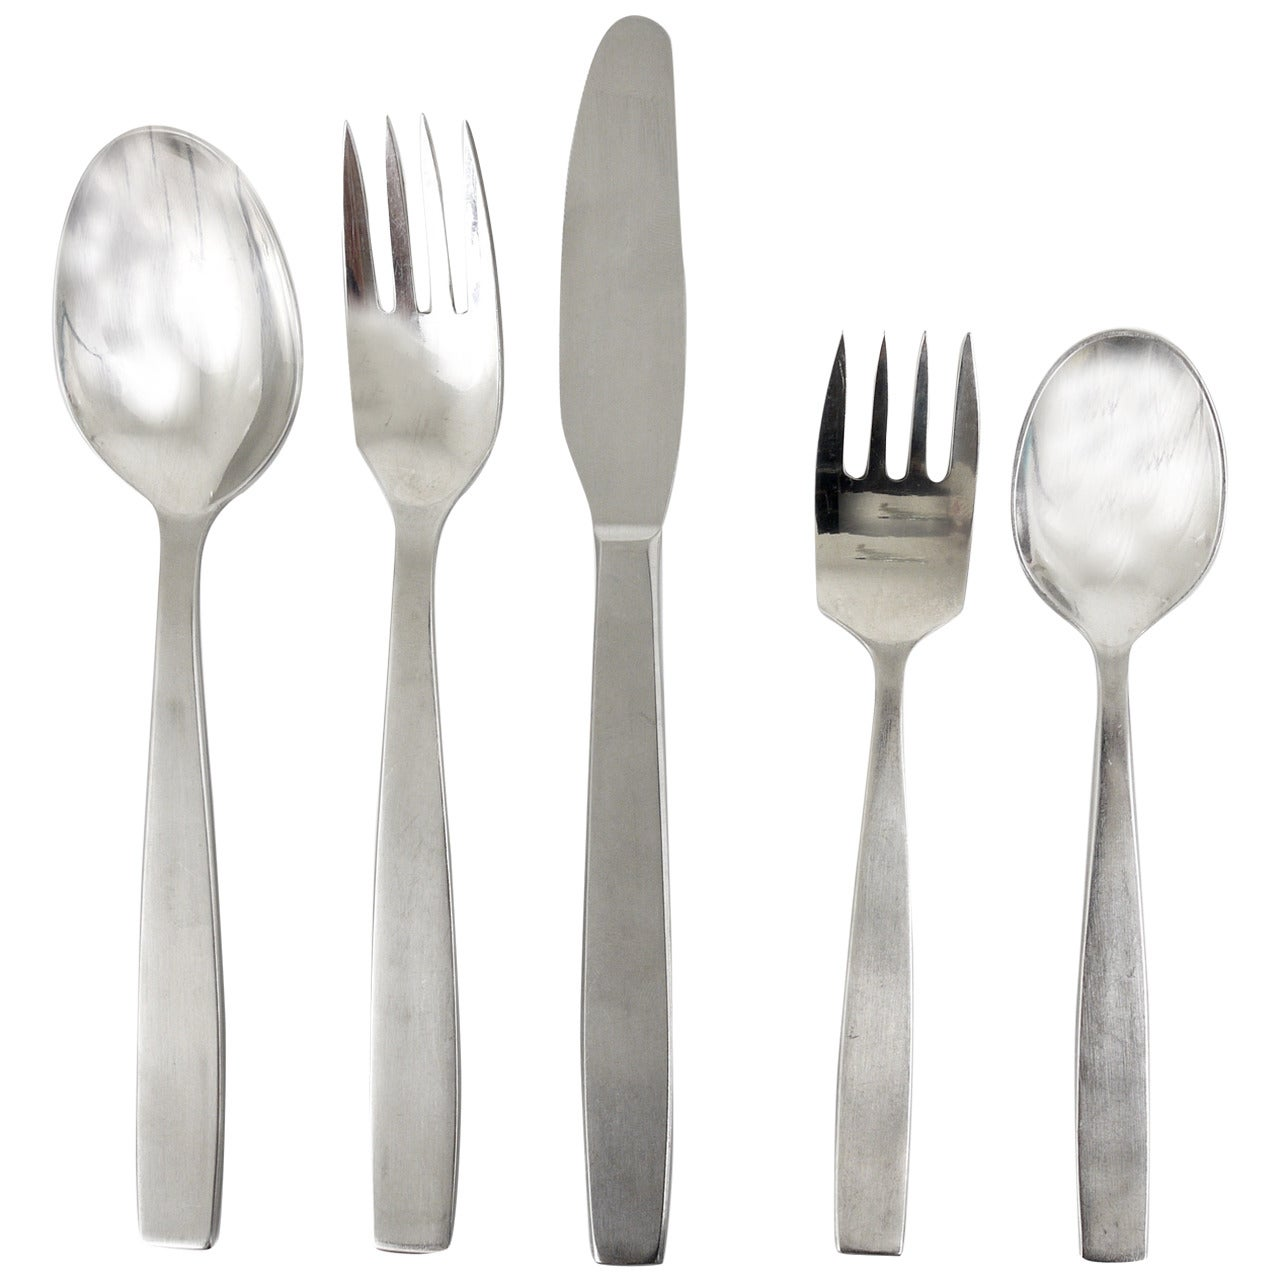 Amboss Austria 2050 Flatware Cutlery for Six Persons by Helmut Alder, 1950s